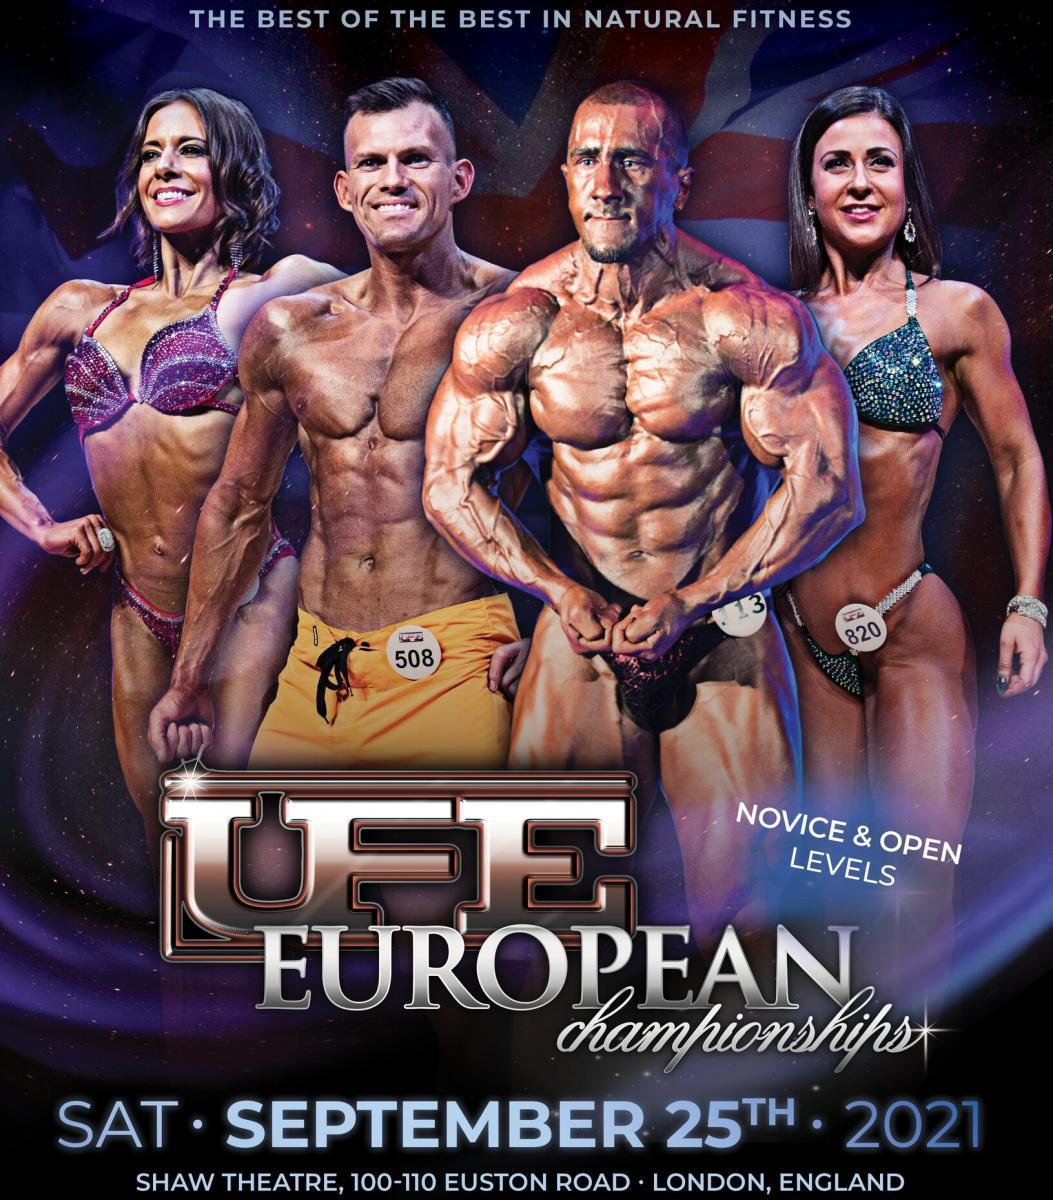 UFE European Championships 2021